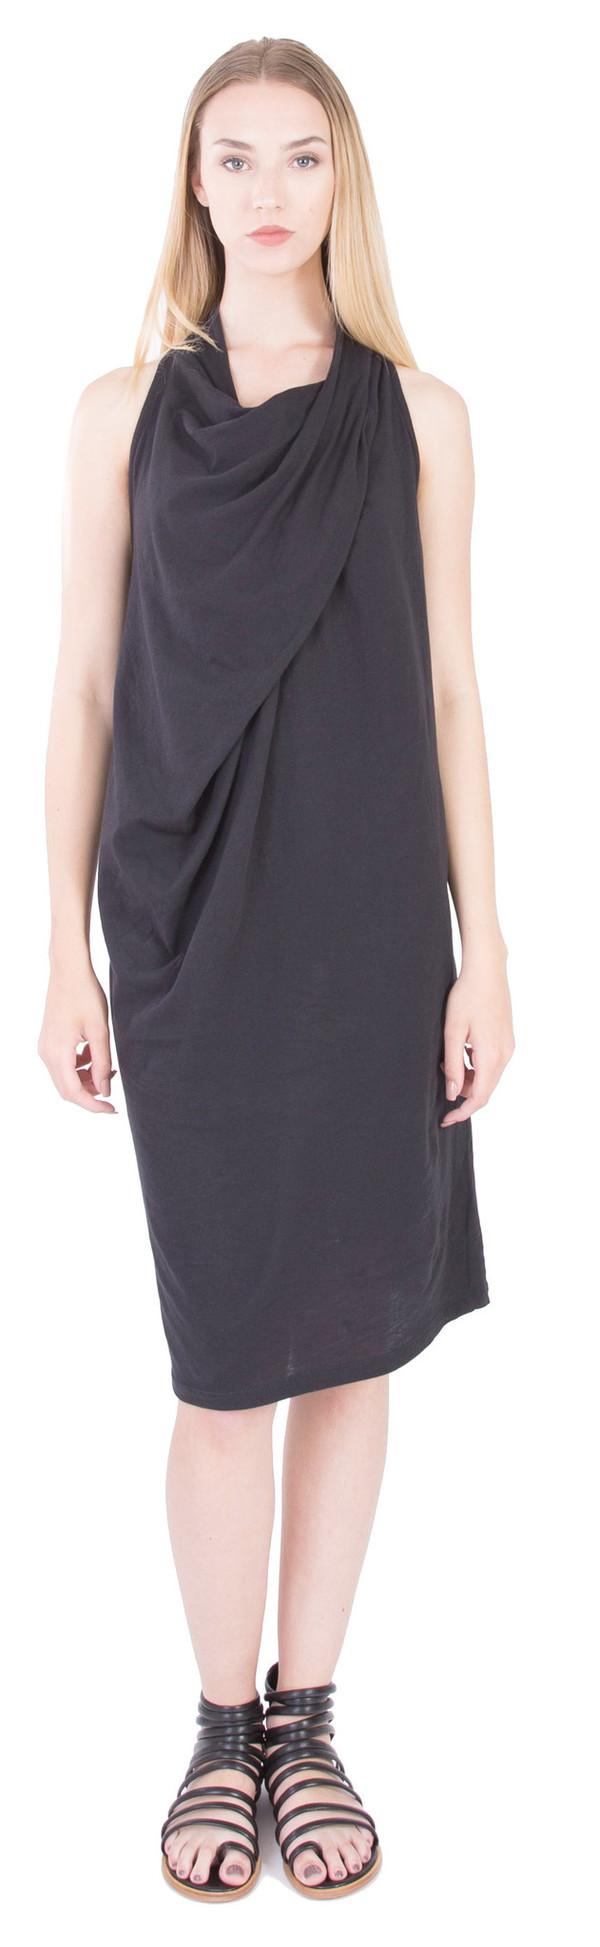 LILYA Rivington Dress in Black